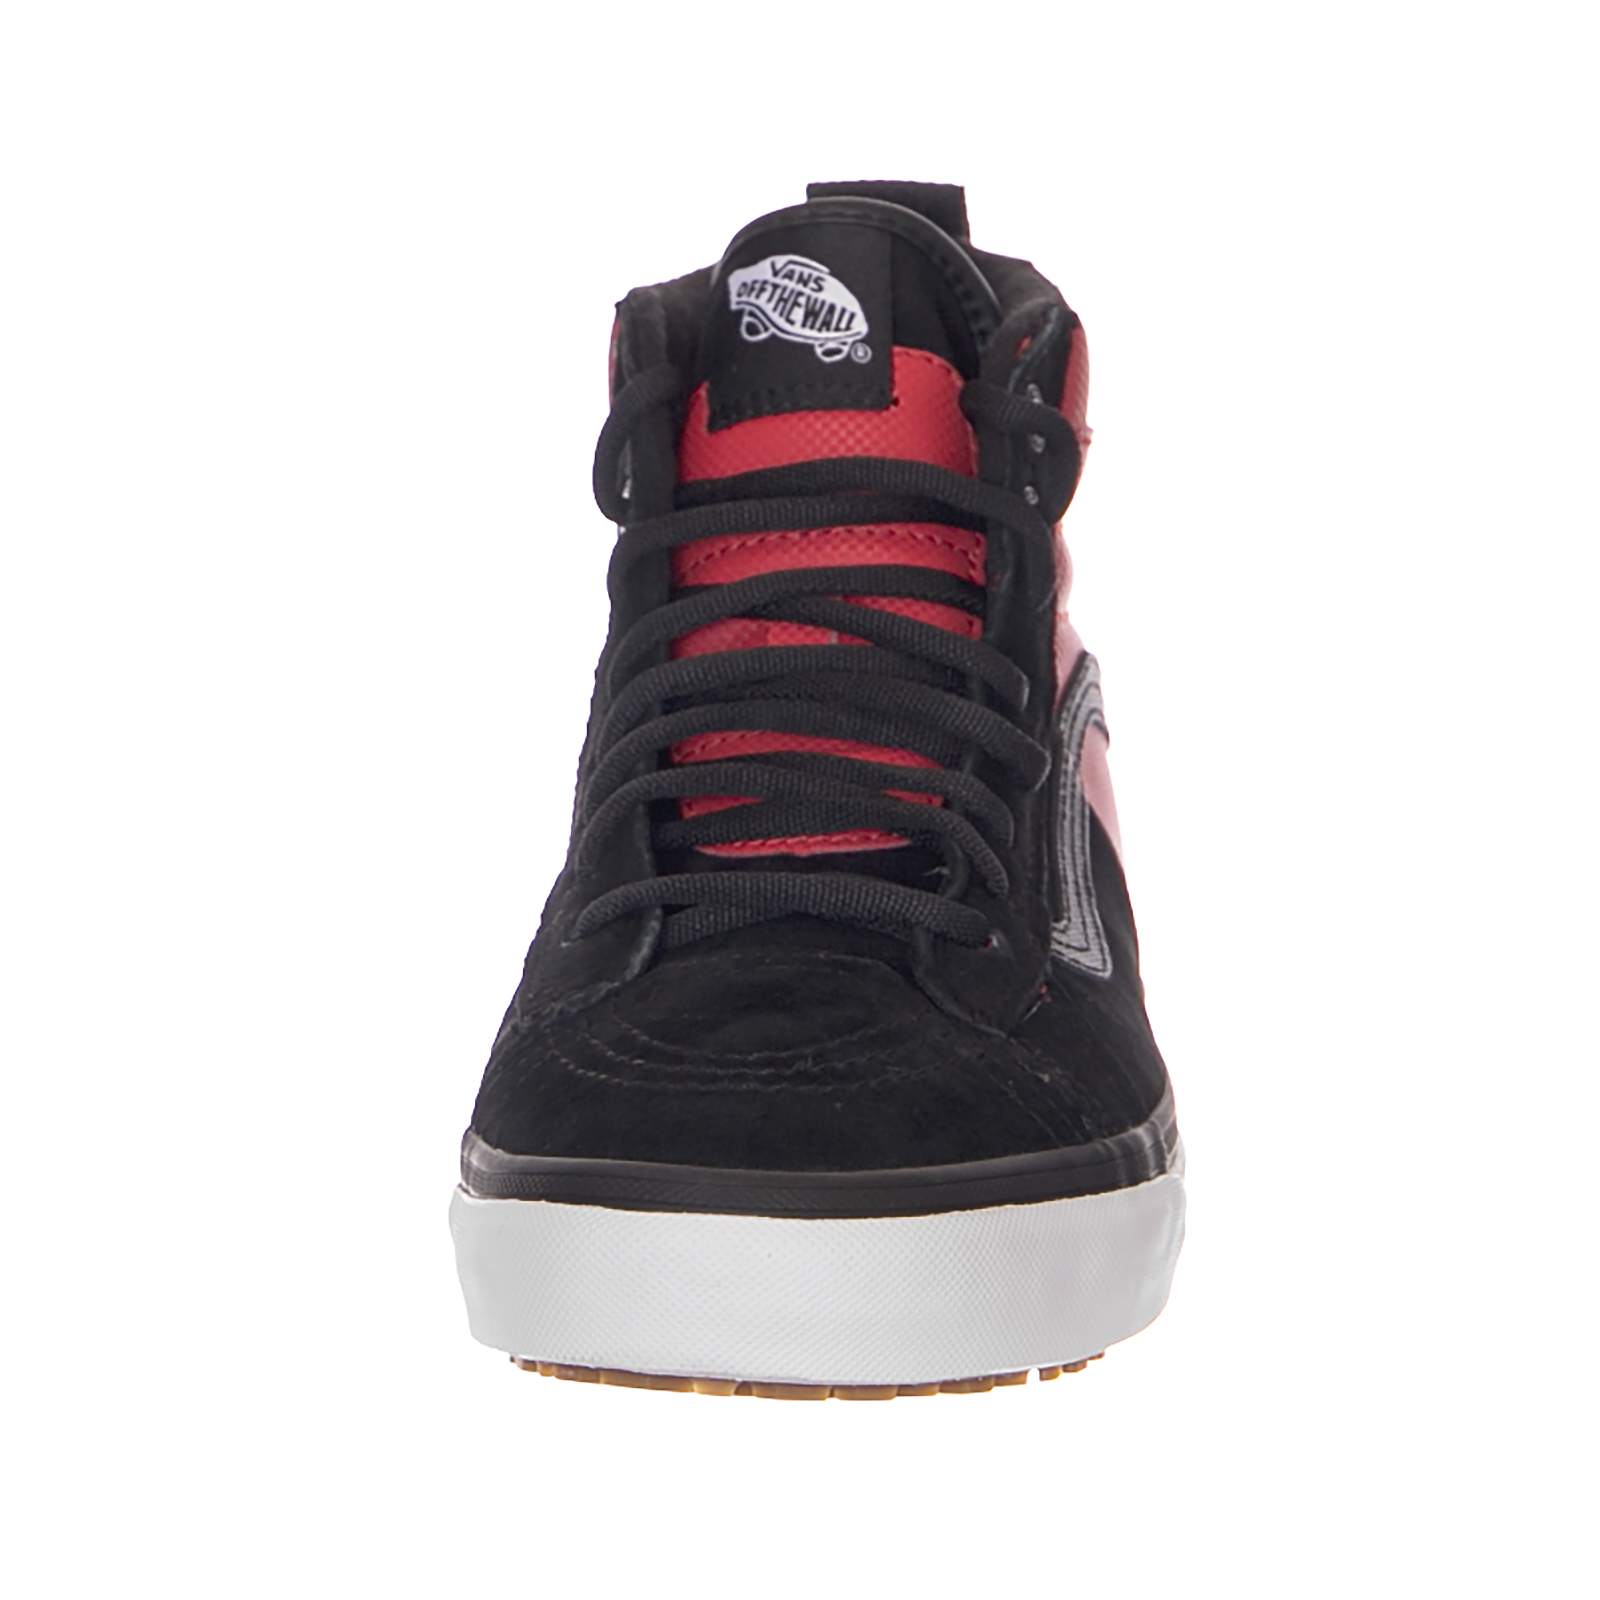 Details about Vans Sneakers Sk8 Hi 46 MTE Dx (MTE) x the North Face Black Red Black